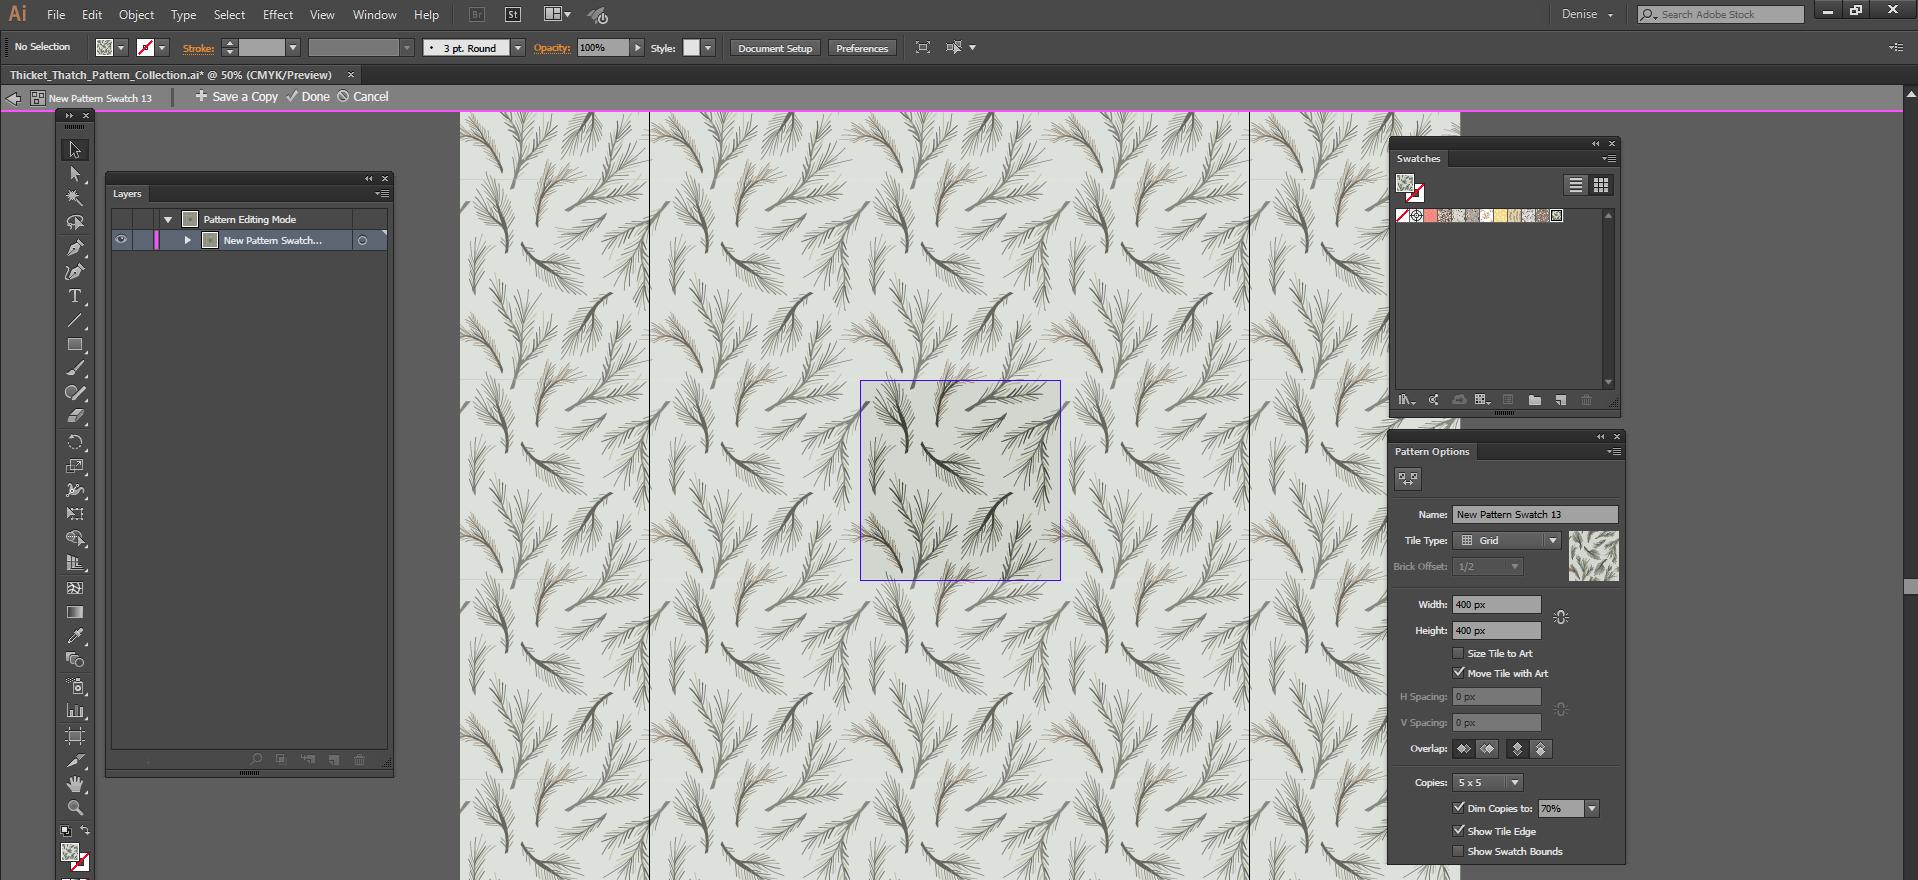 pattern_options_panel